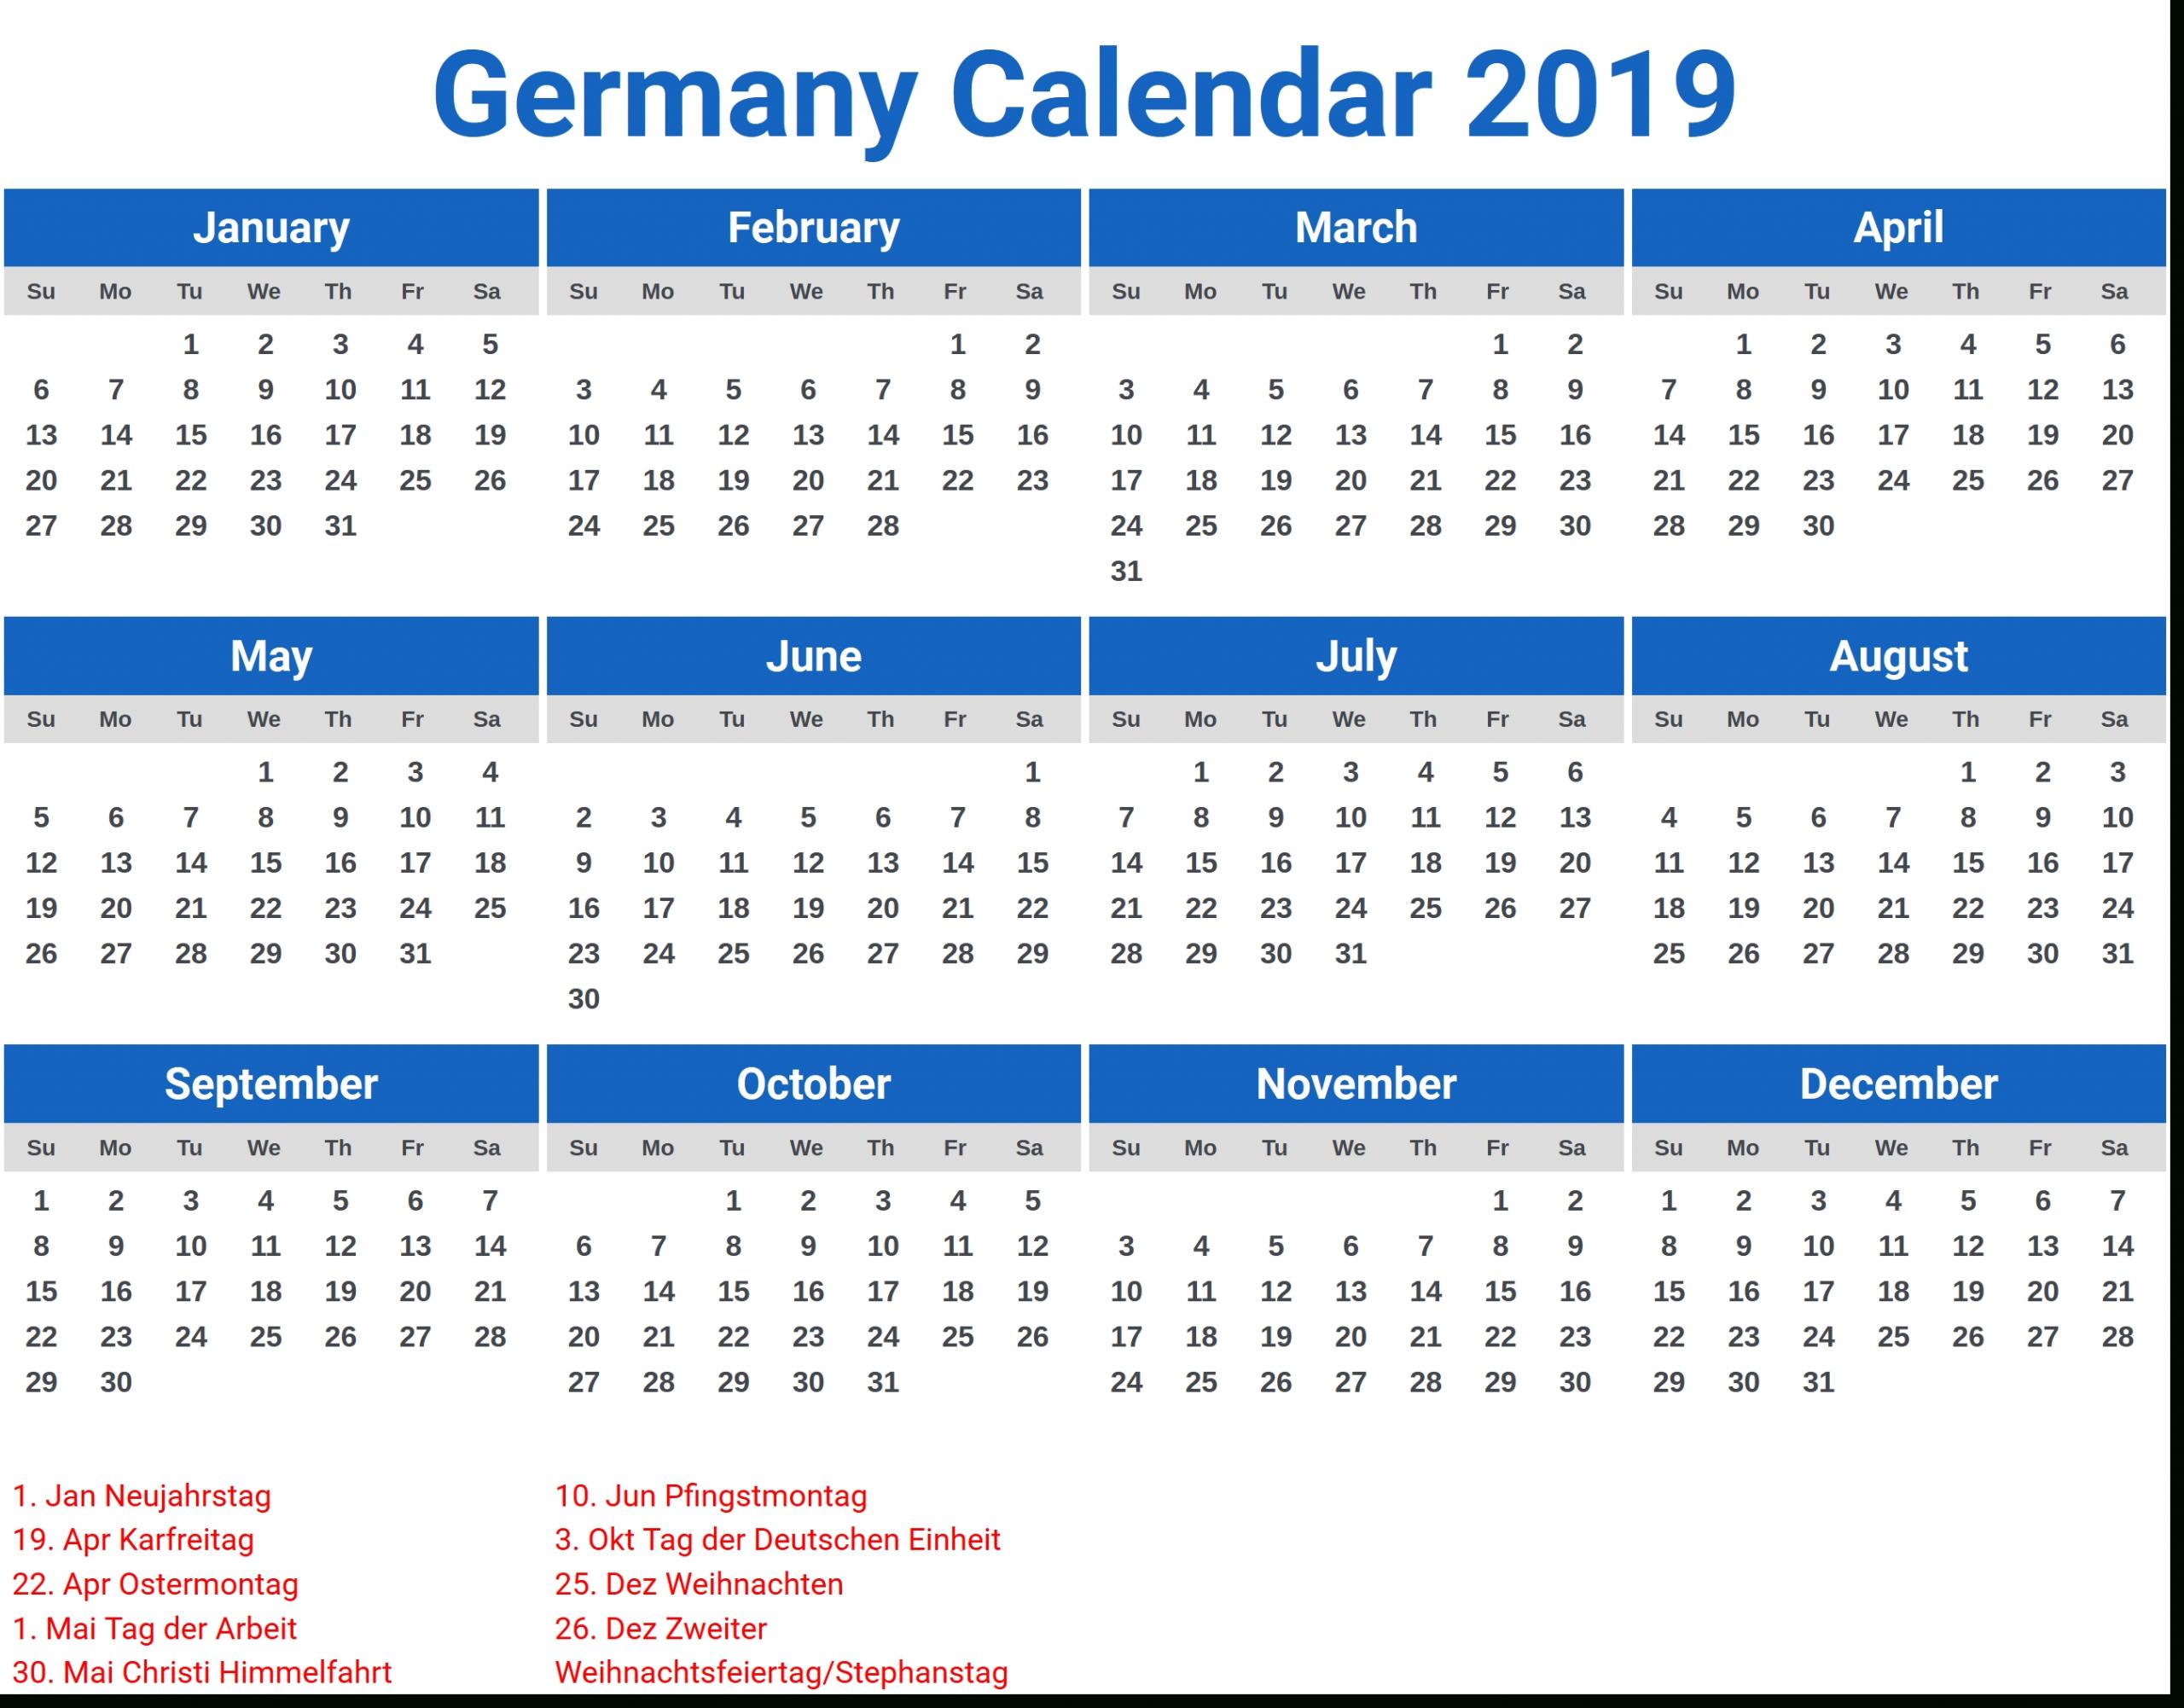 Germany 2019 Calendar With Holidays | Calendar Template